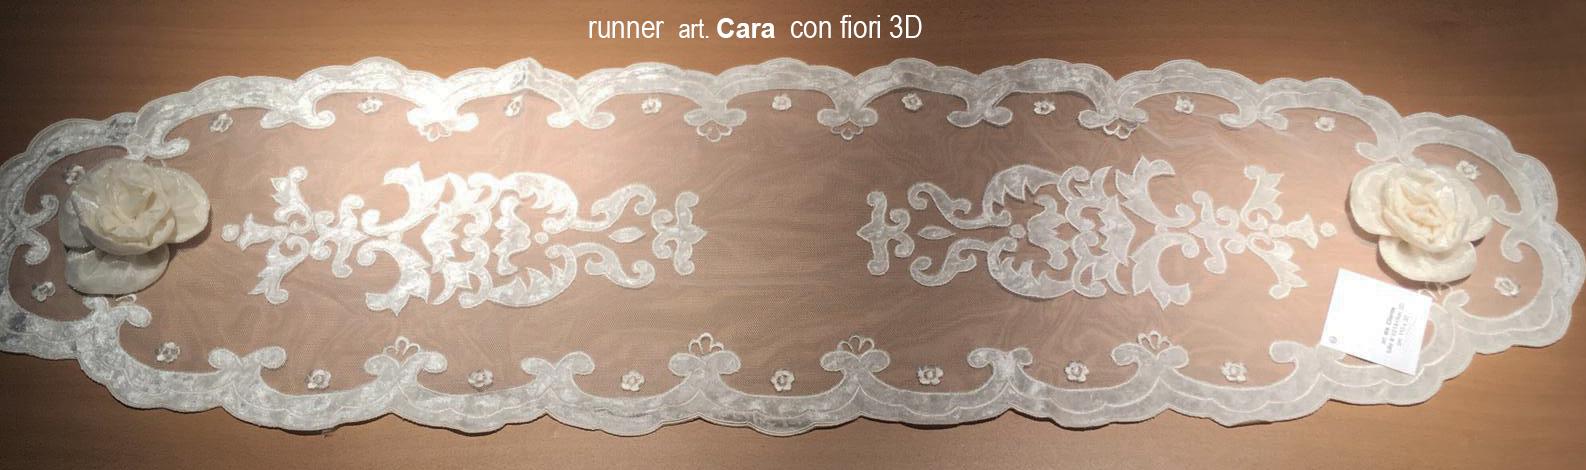 06 runner Cara con fiori 3D